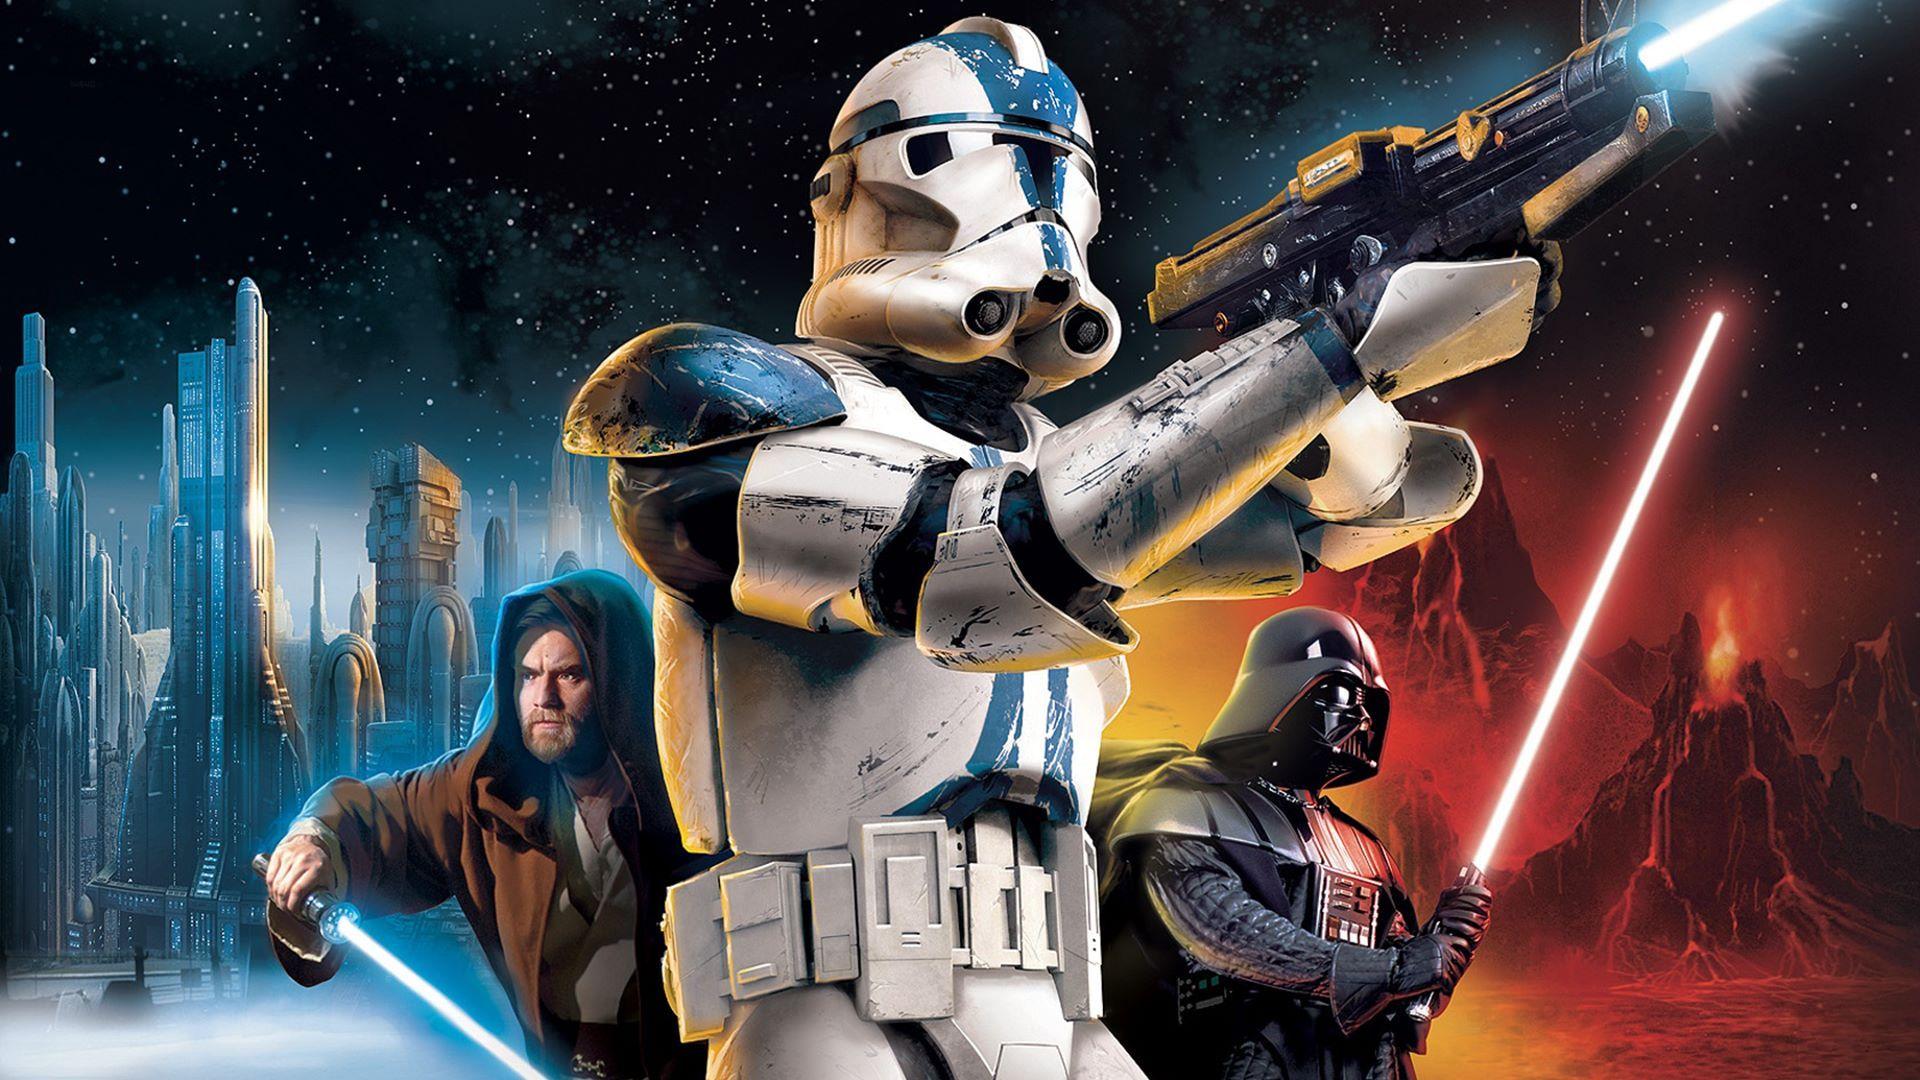 10 Best Star Wars Games Ranked Top Star Wars Video Gaming Titles